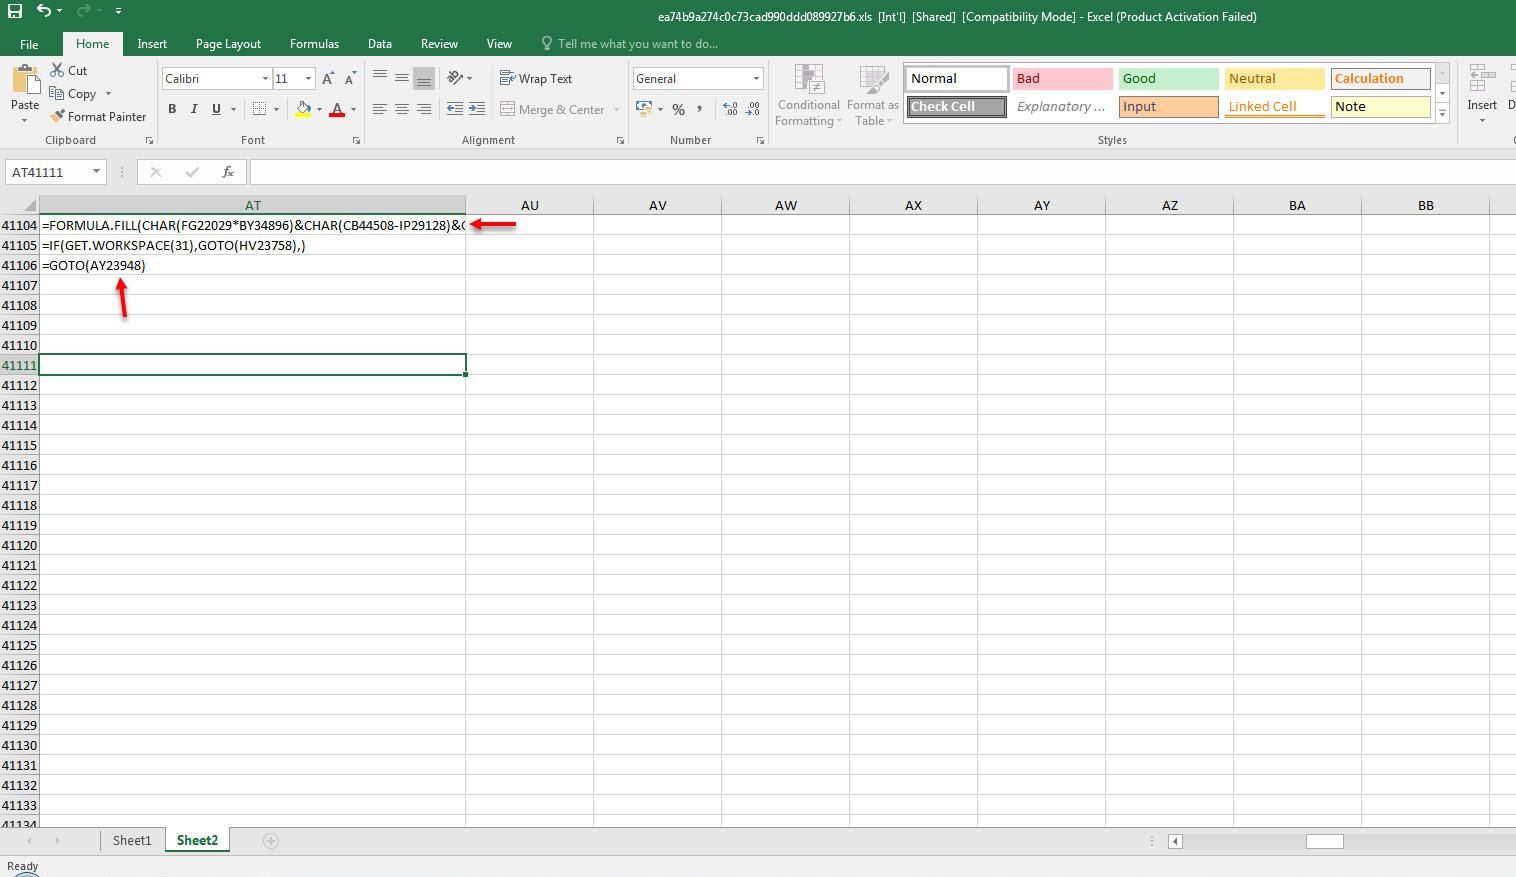 XLM Macro Analysis